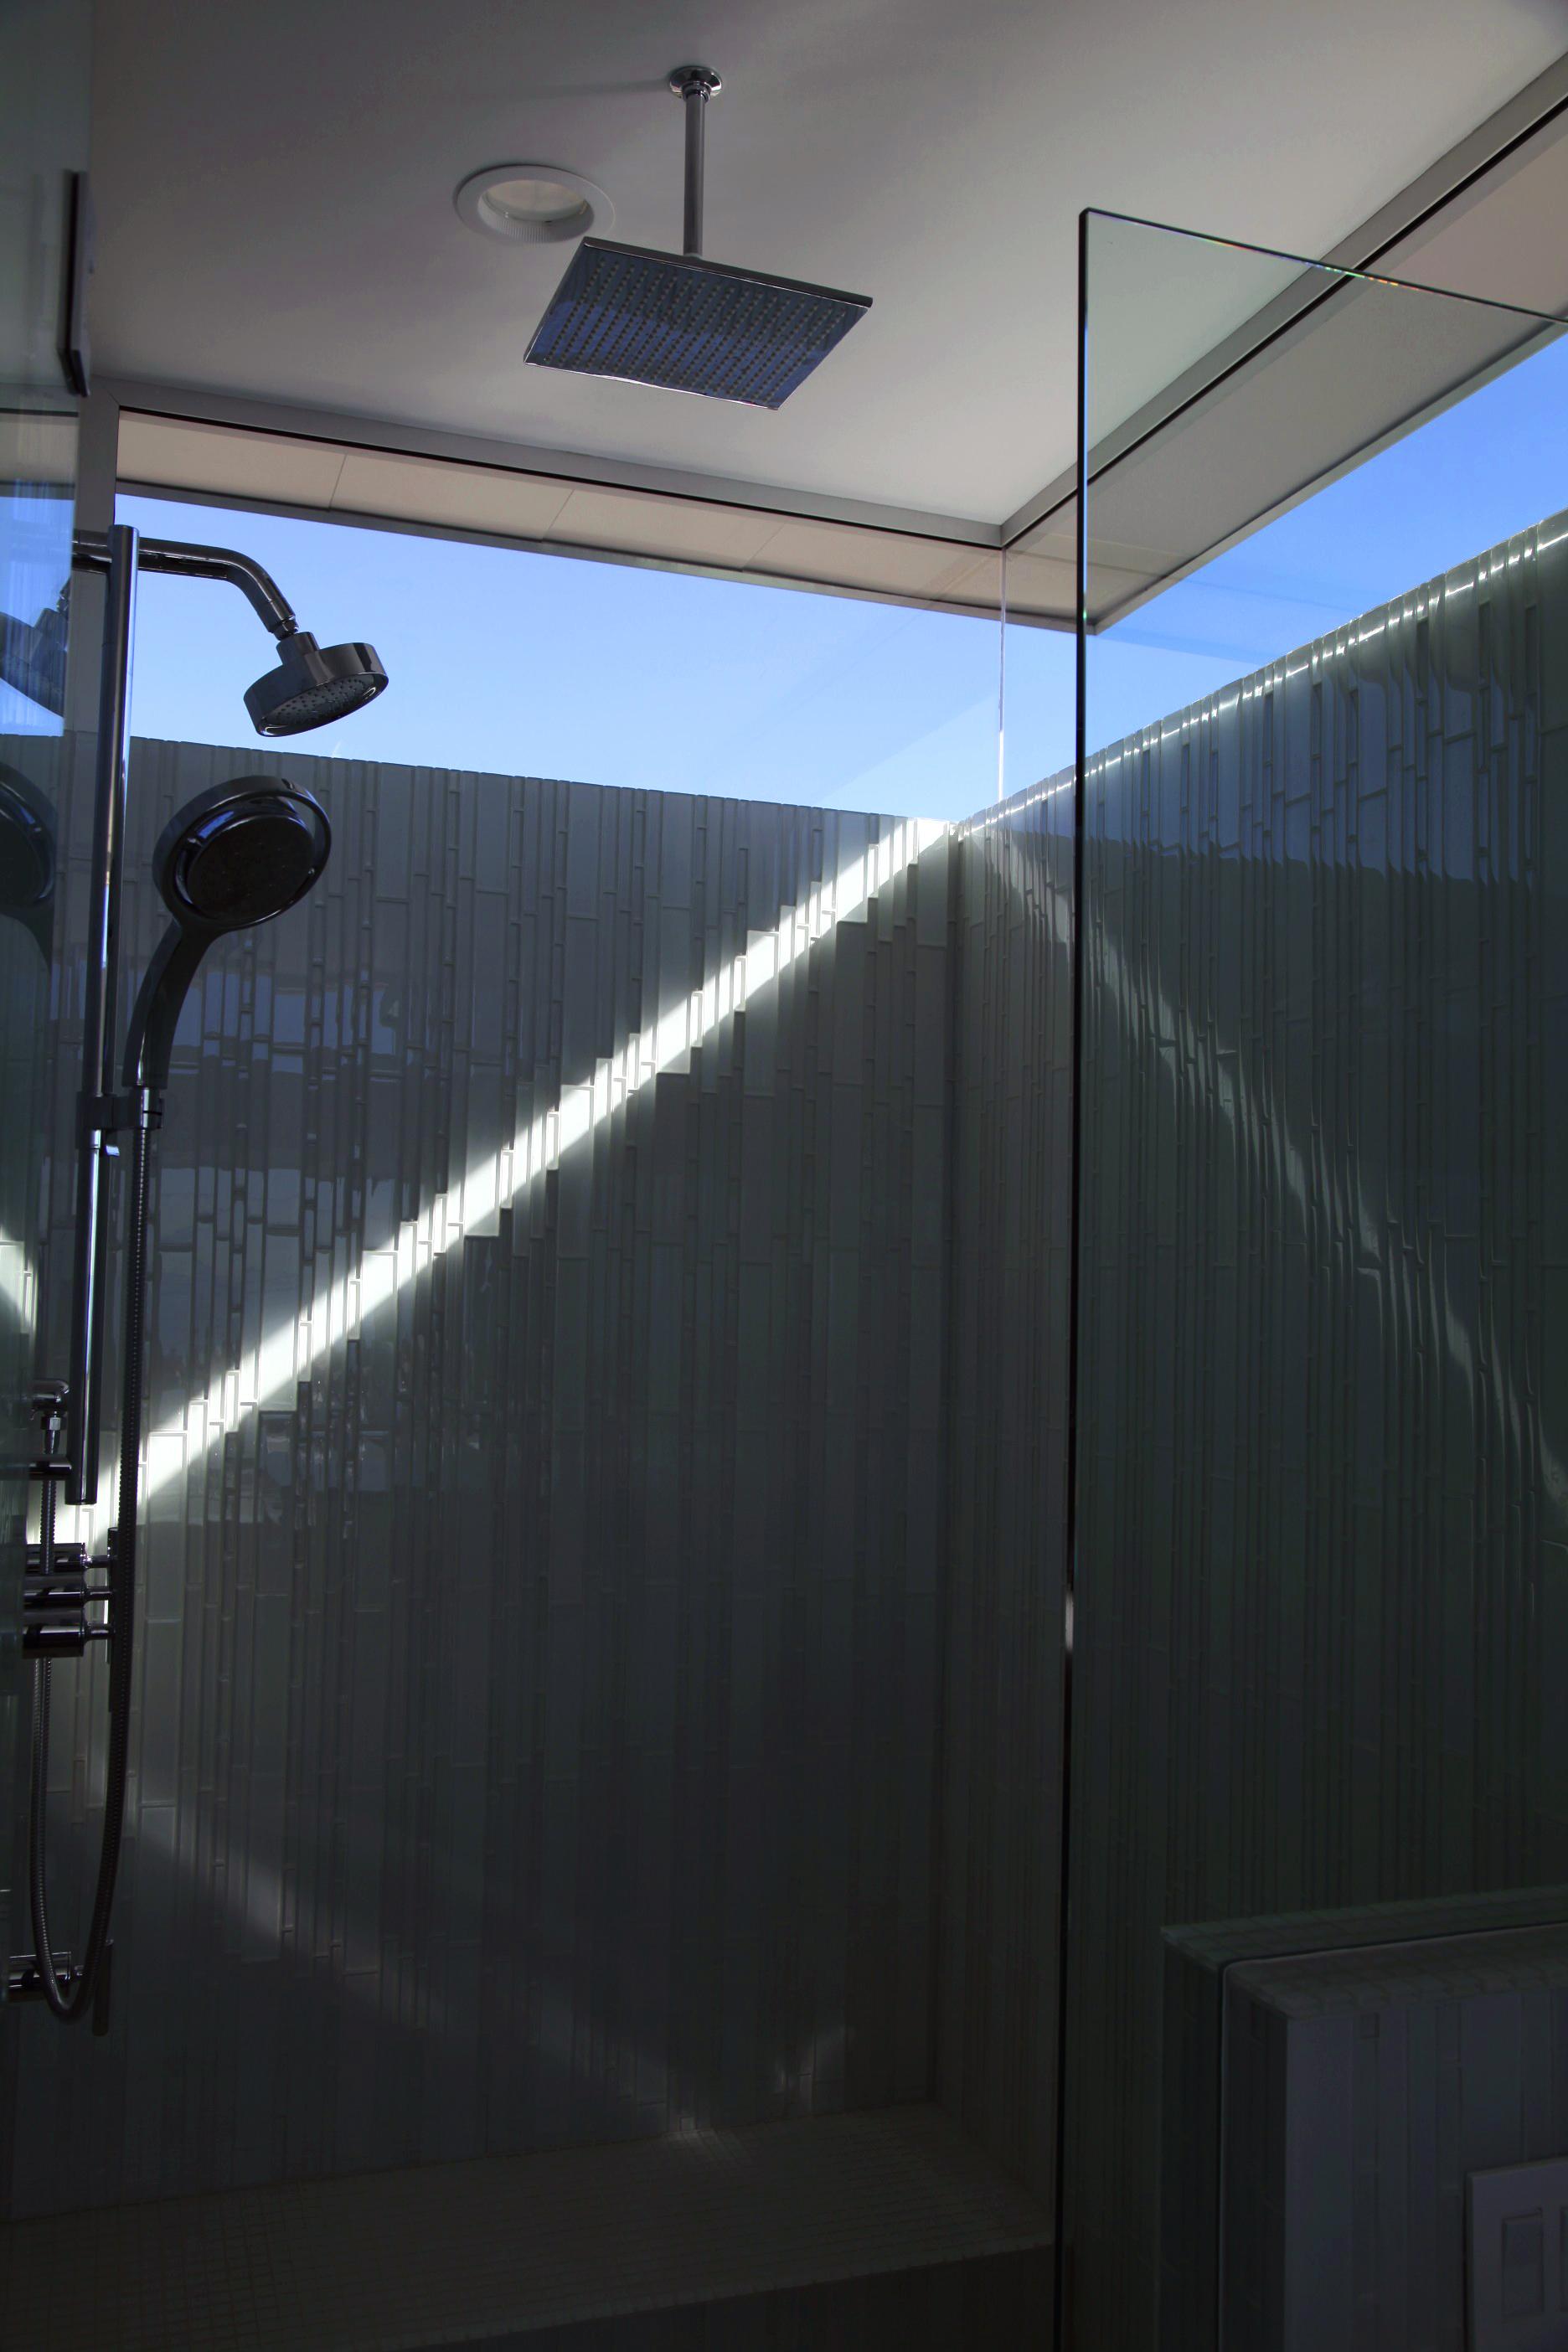 S.E.A.-Studio-Environmental-Architecture-David-Hertz-FAIA-Panel-House-Venice-Beach-California-sustainable-regenerative-restorative-green-design-prefabricated-aluminum-refrigeration-open-concept-ocean-view-residential-glass-steel-sunset-shower-12.jpg